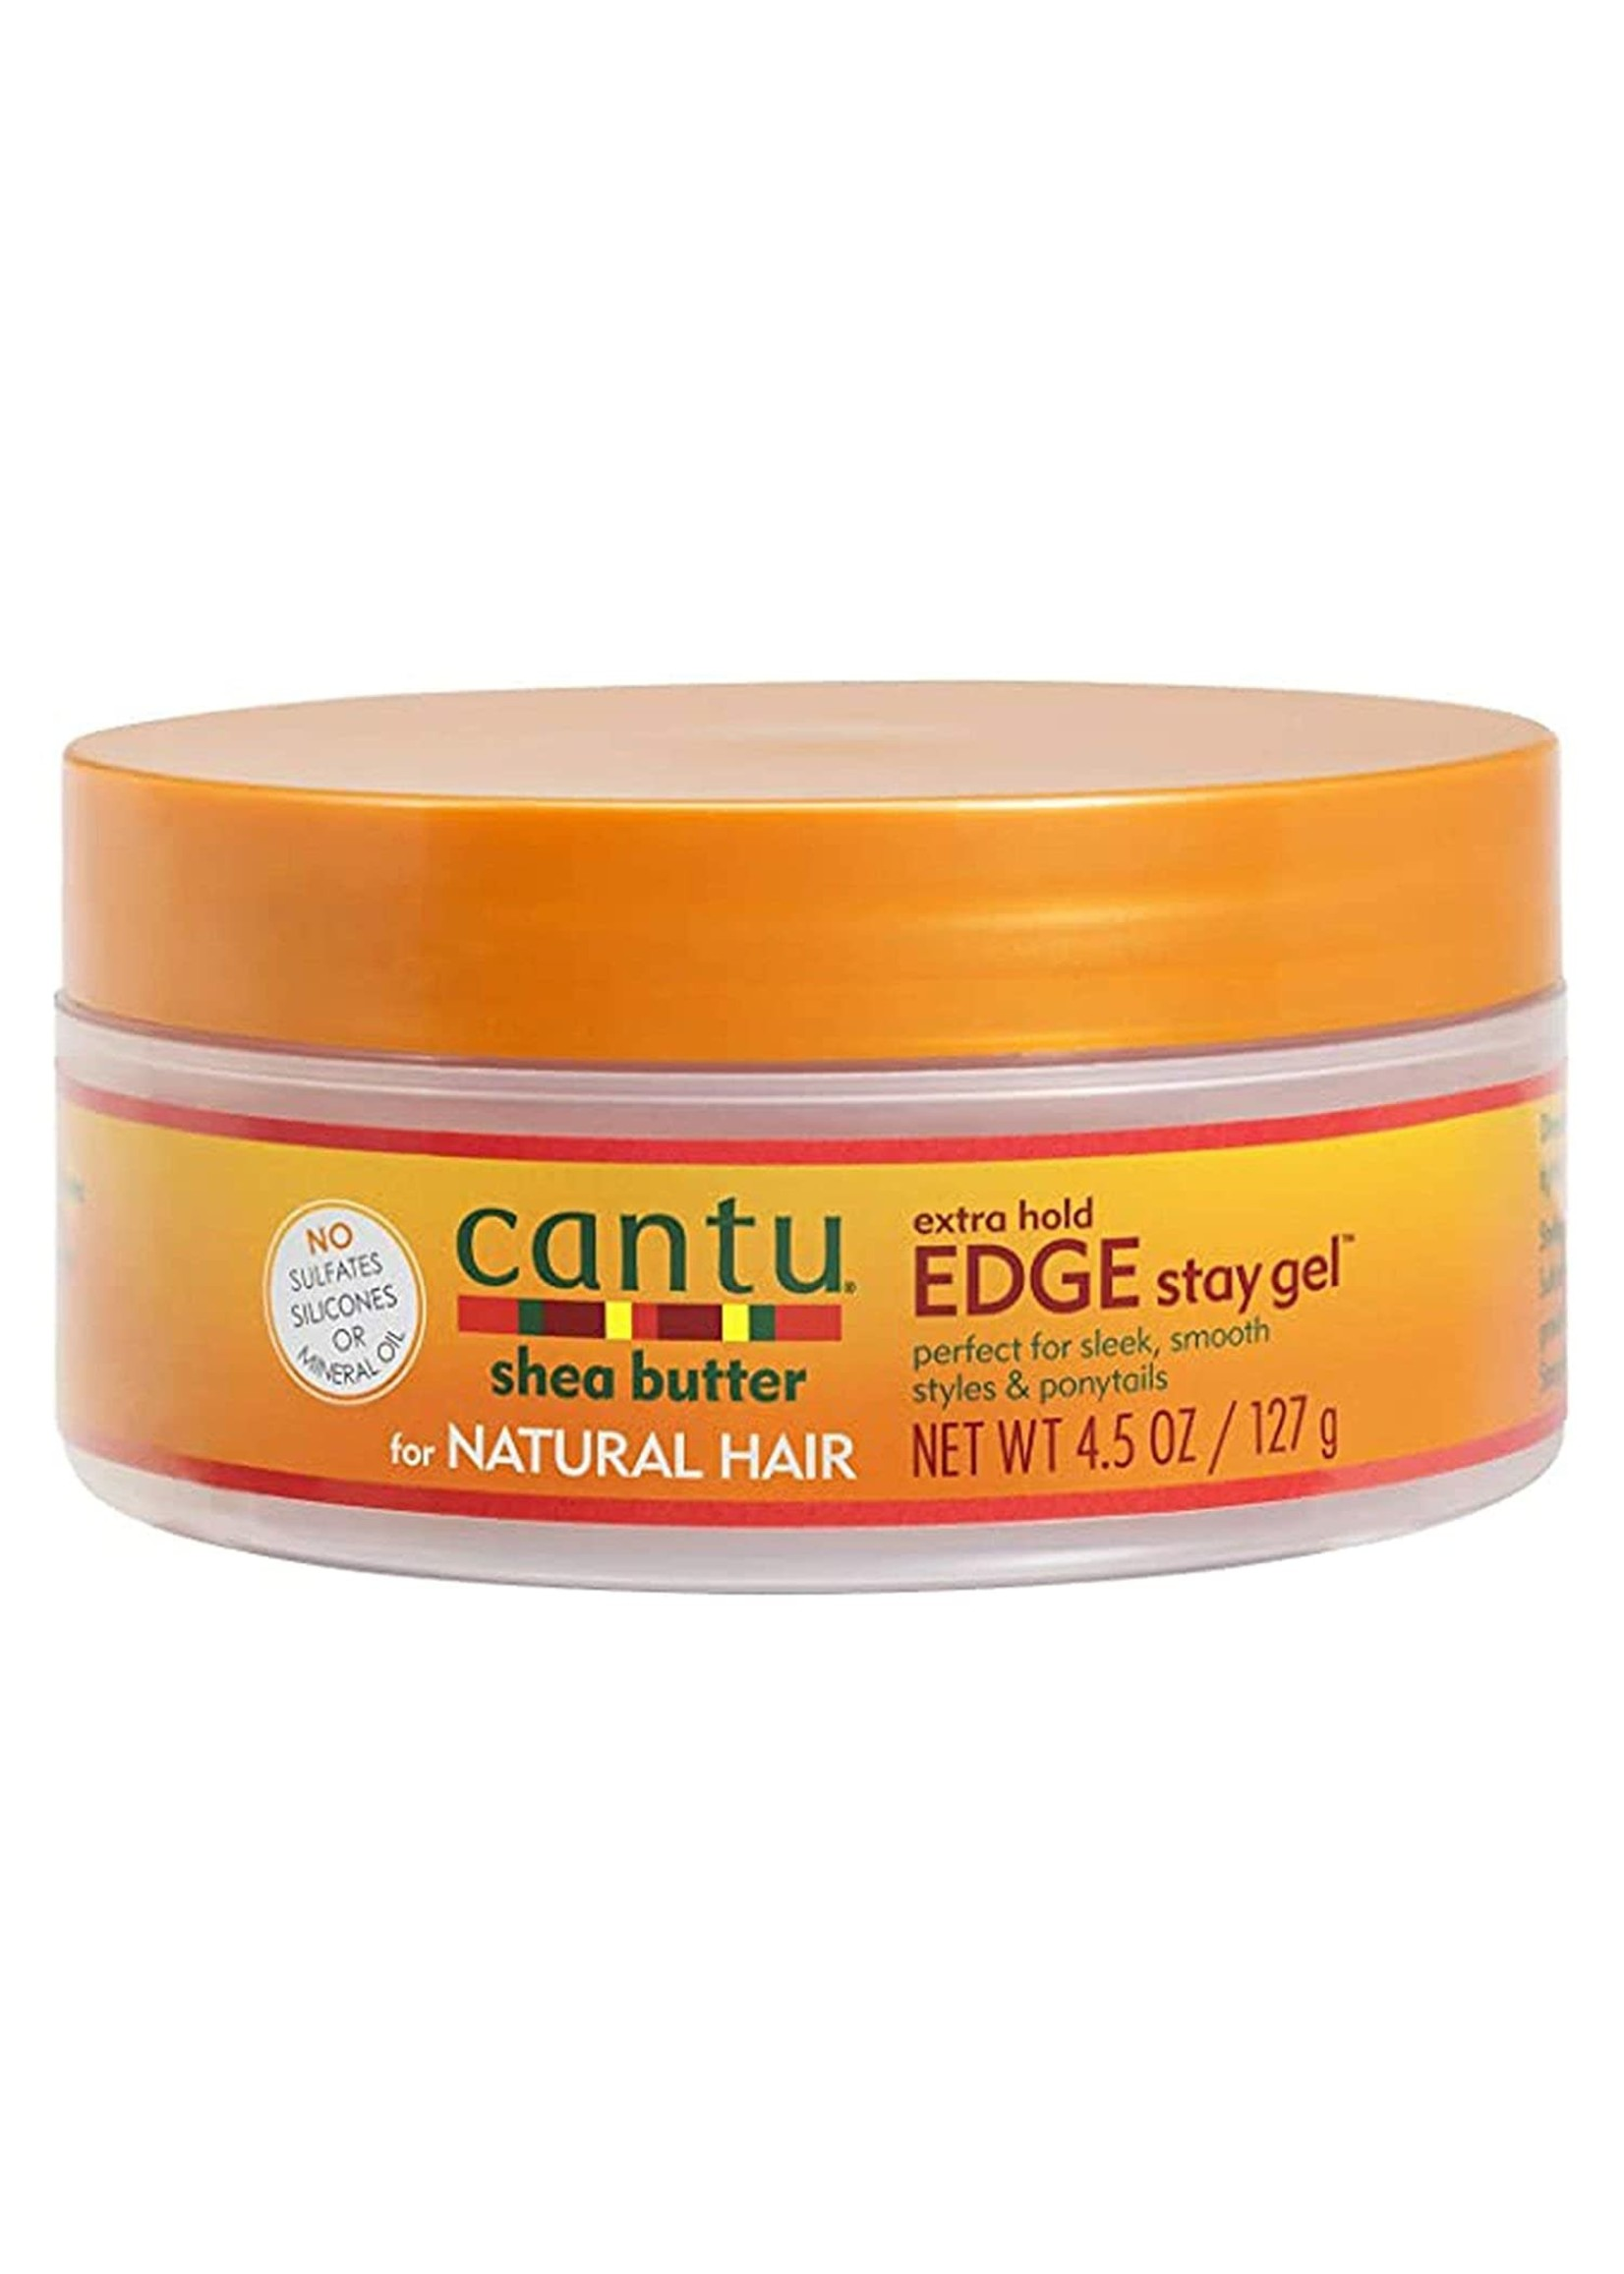 Cantu Shea Butter Natural Hold Edge Stay Gel